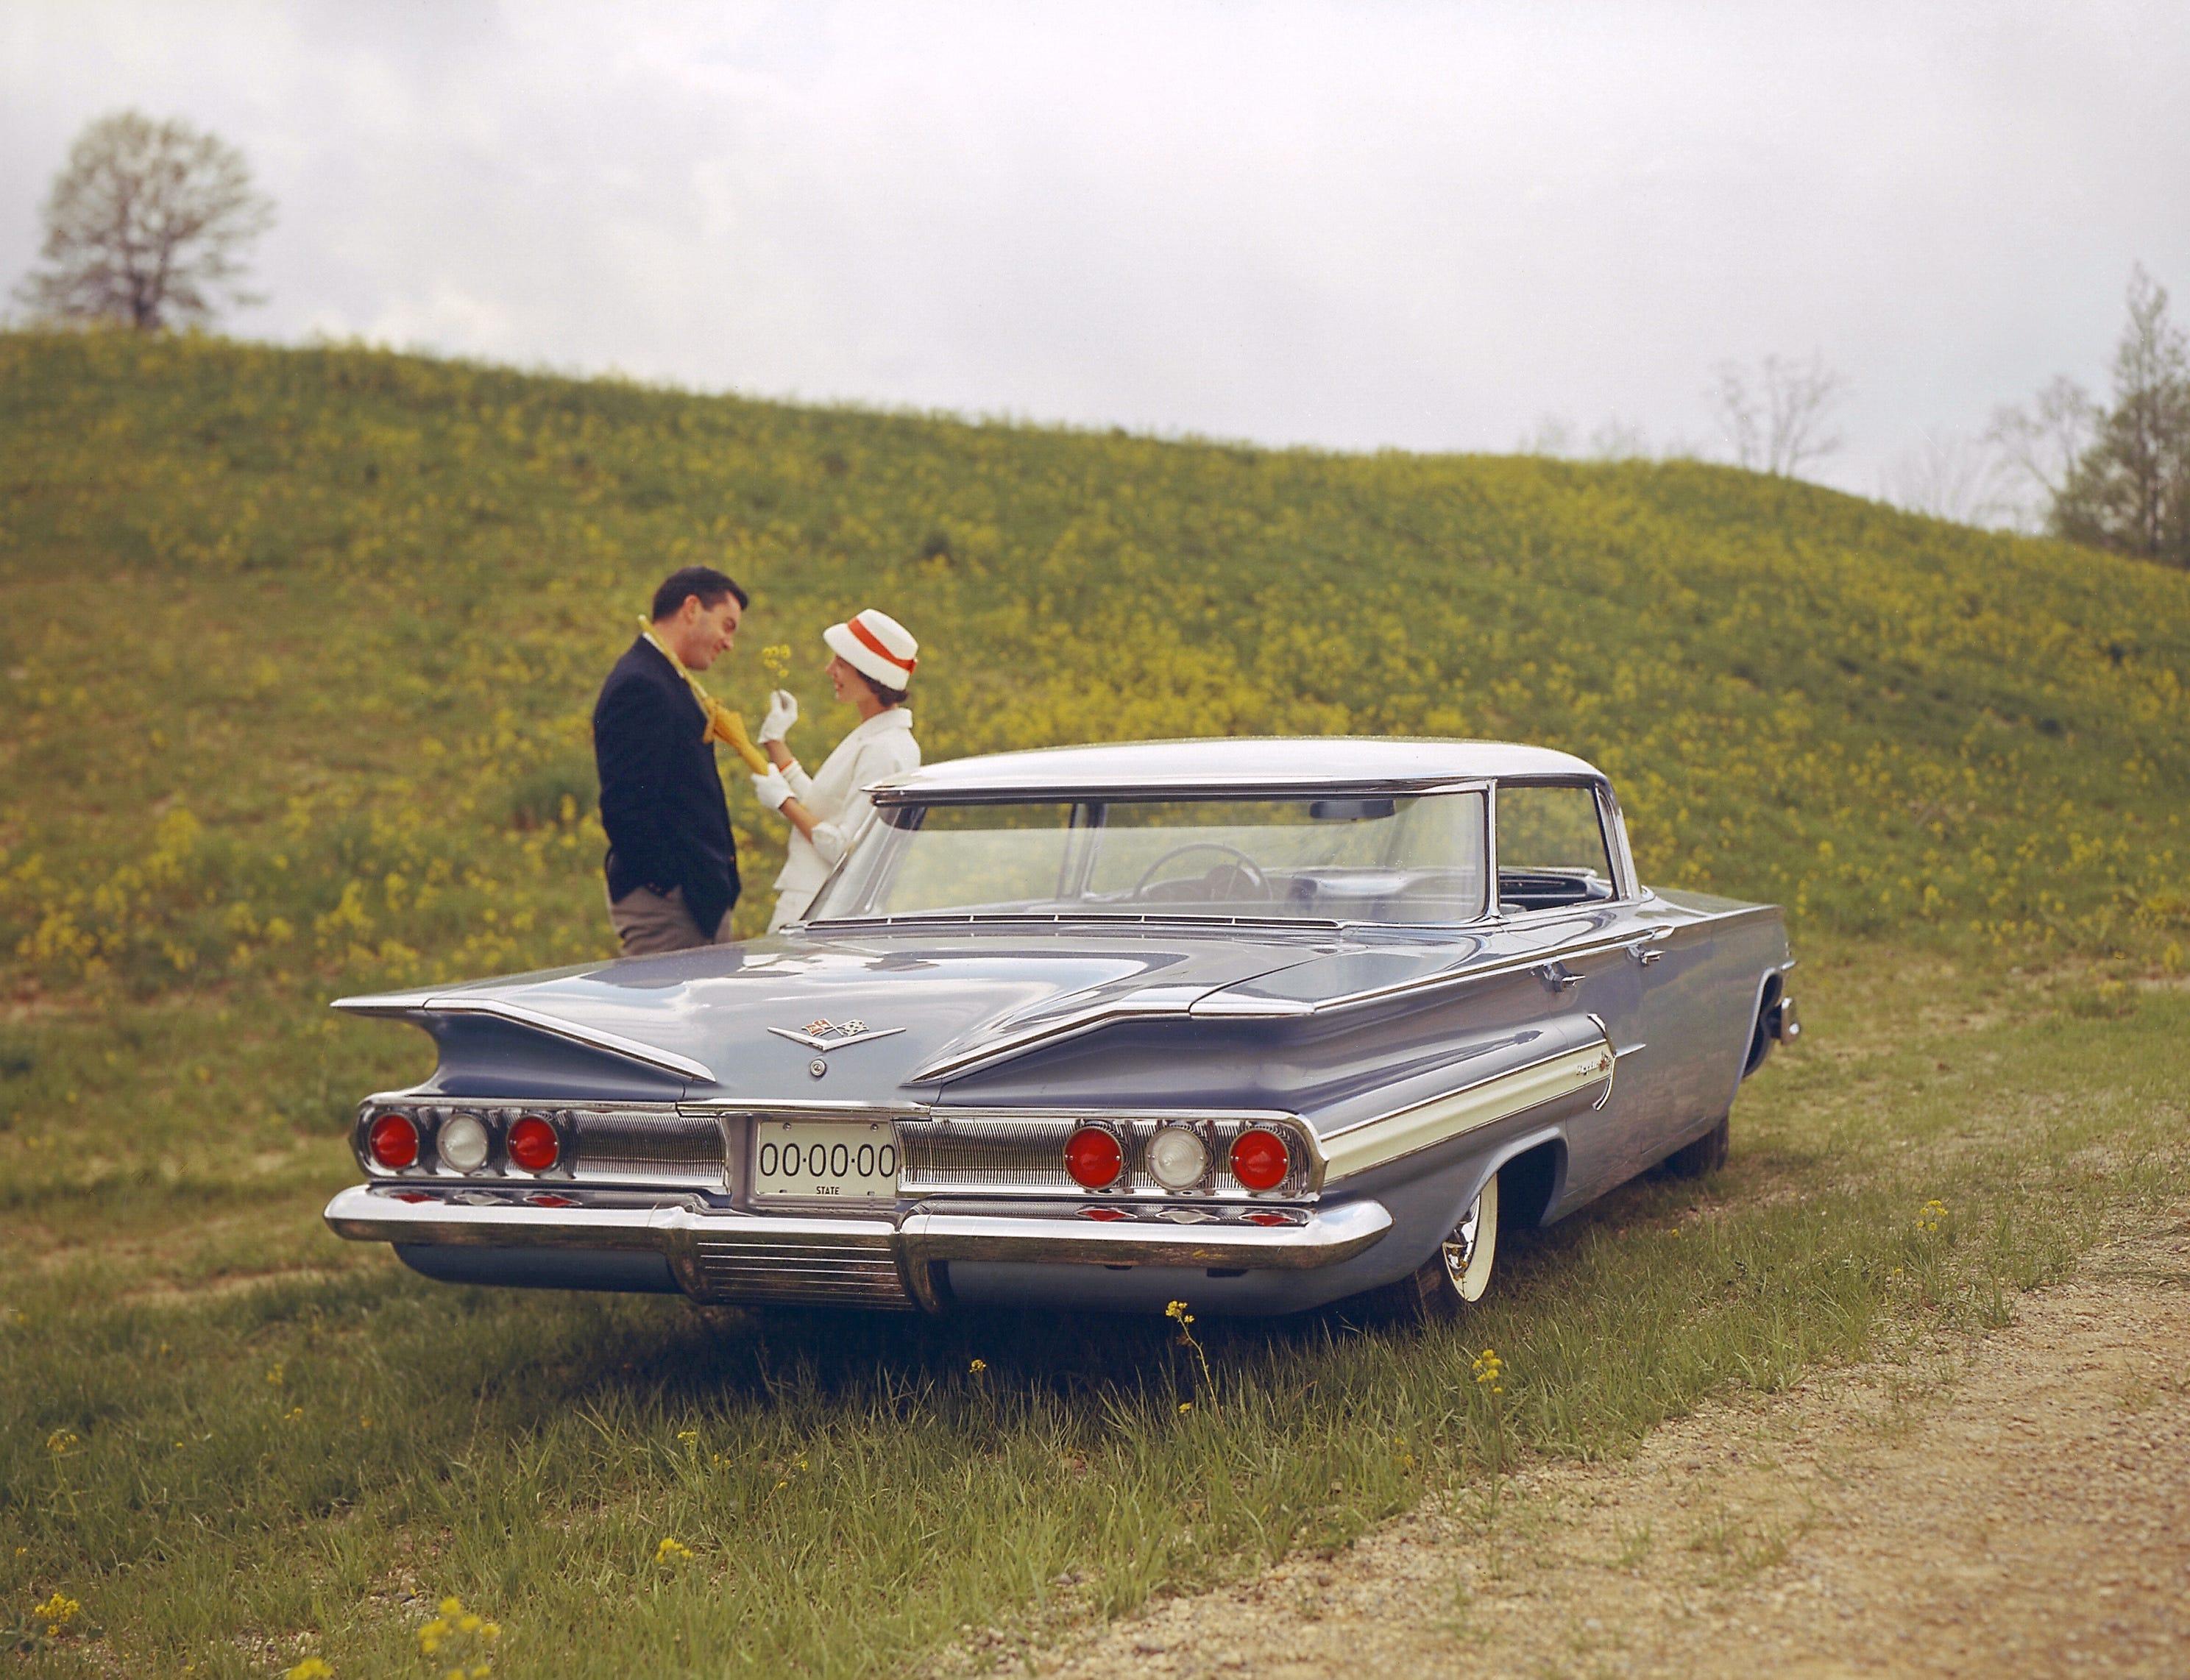 Chevrolet Impala S Last Run Production To Cease Thursday